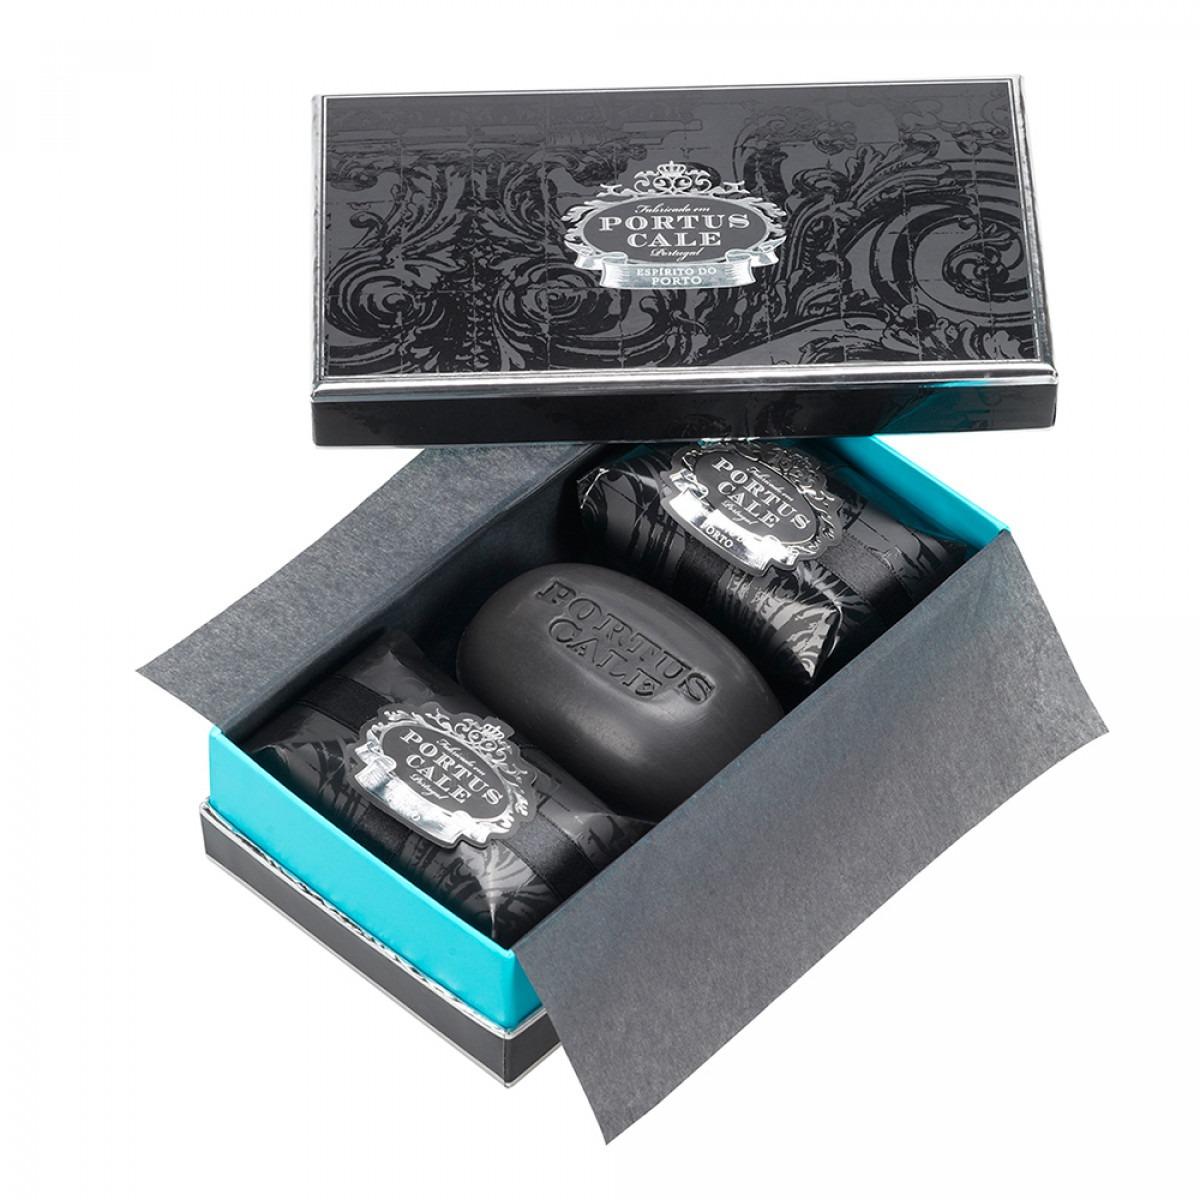 Portus Cale Back Edition Set of 3 Soaps